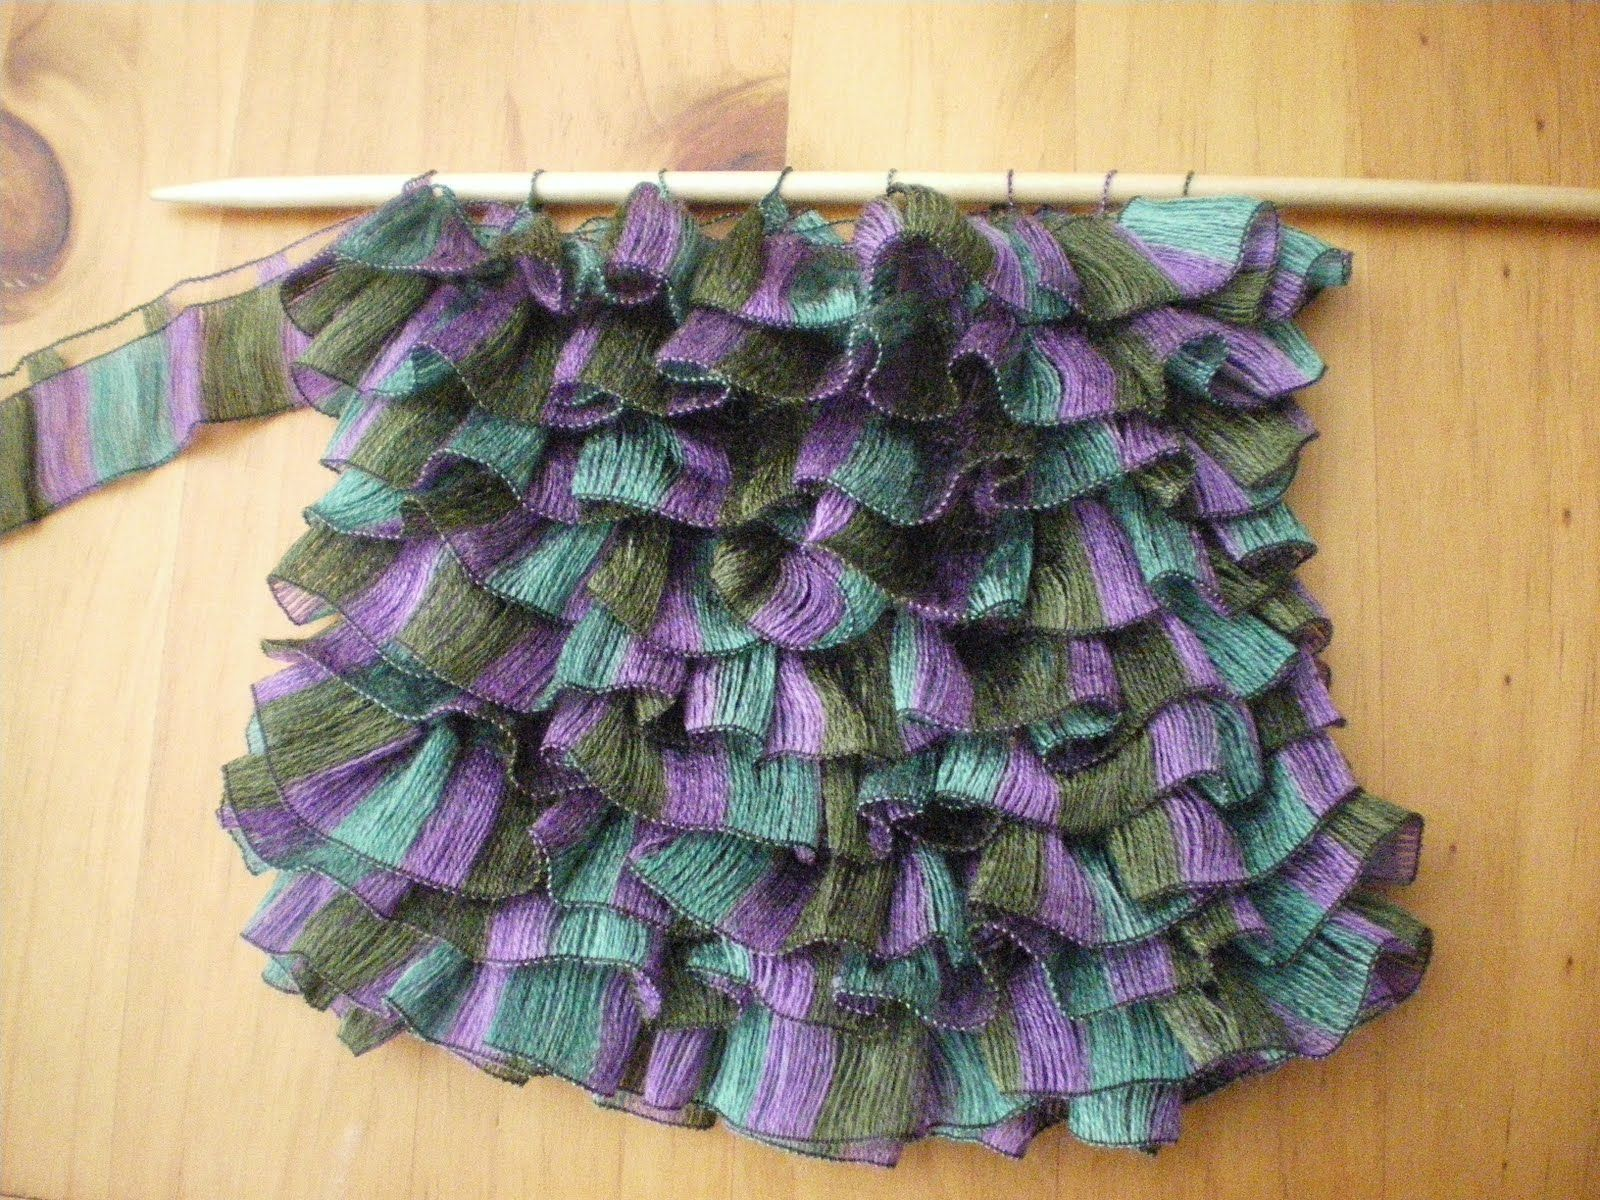 Images of Ribbon Yarn | knits & crochet | Pinterest | Yarns, Scarves ...